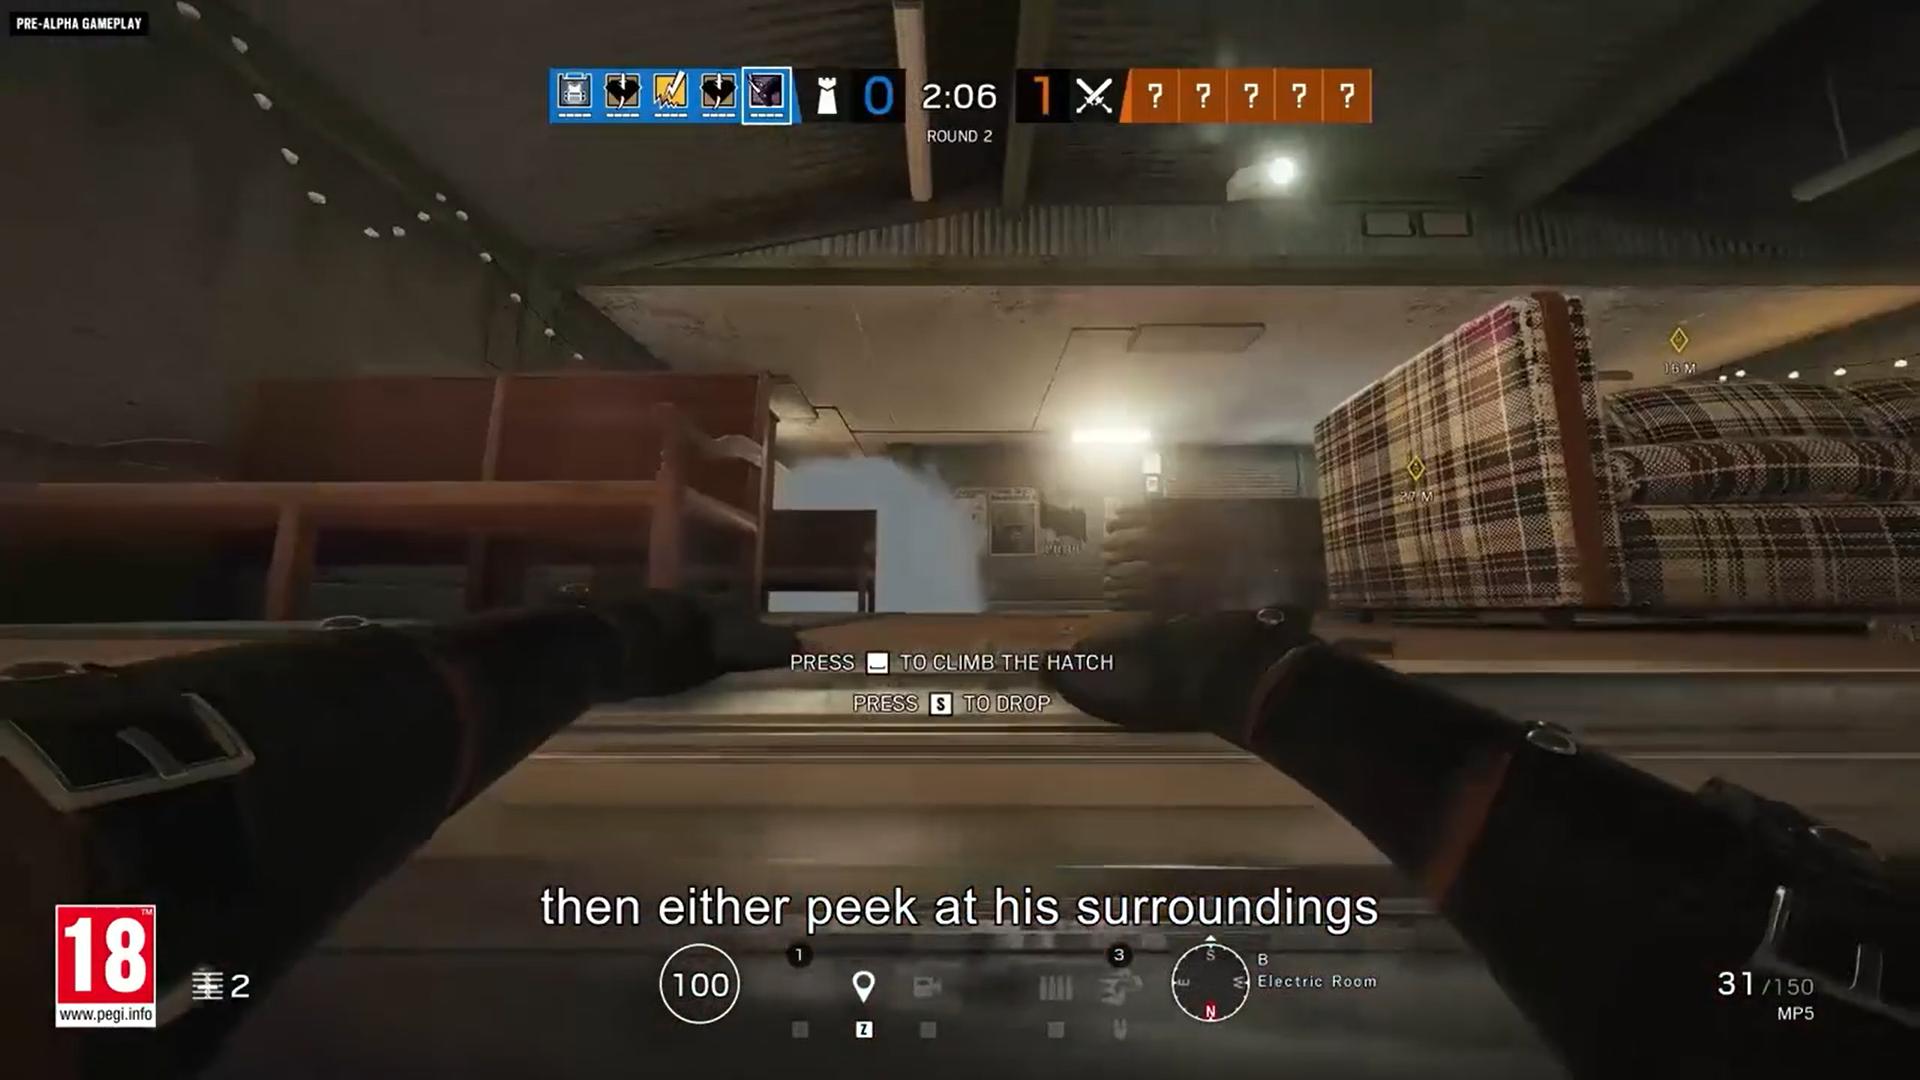 Oryx leap gadget in Rainbow 6